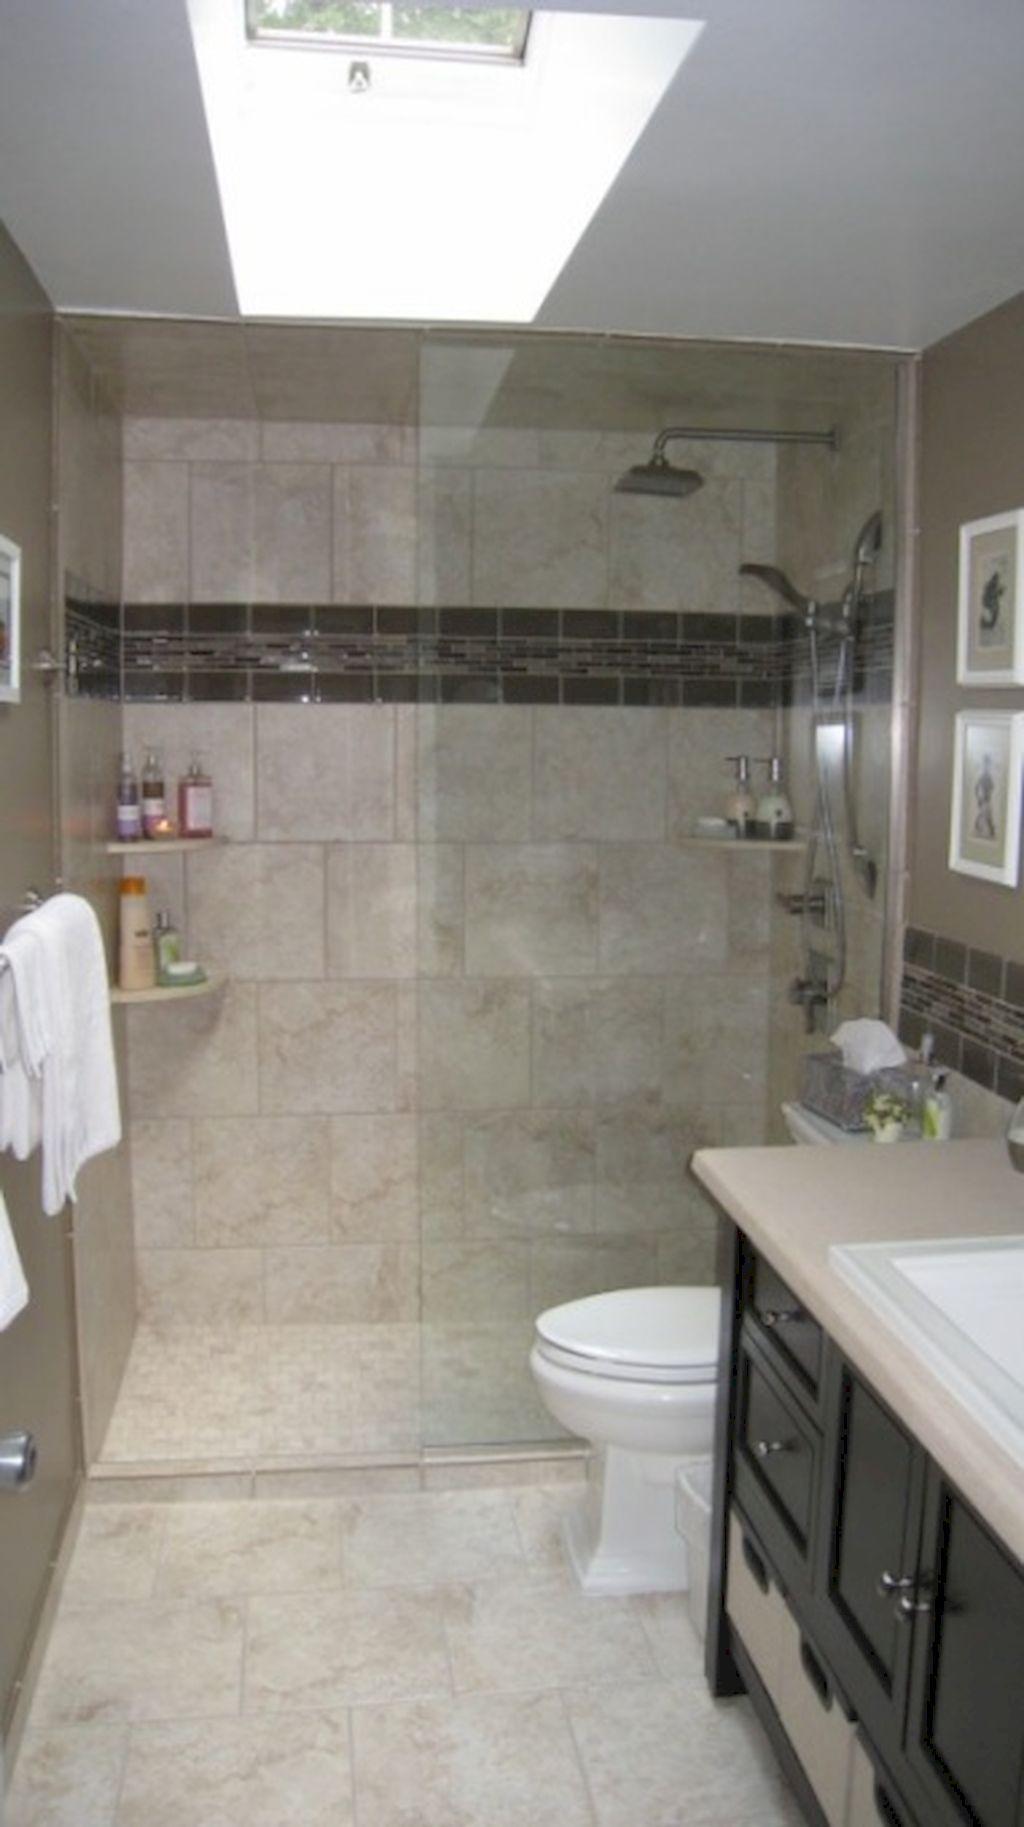 60 great small bathroom ideas remodel small bathroom on cool small bathroom design ideas id=85501